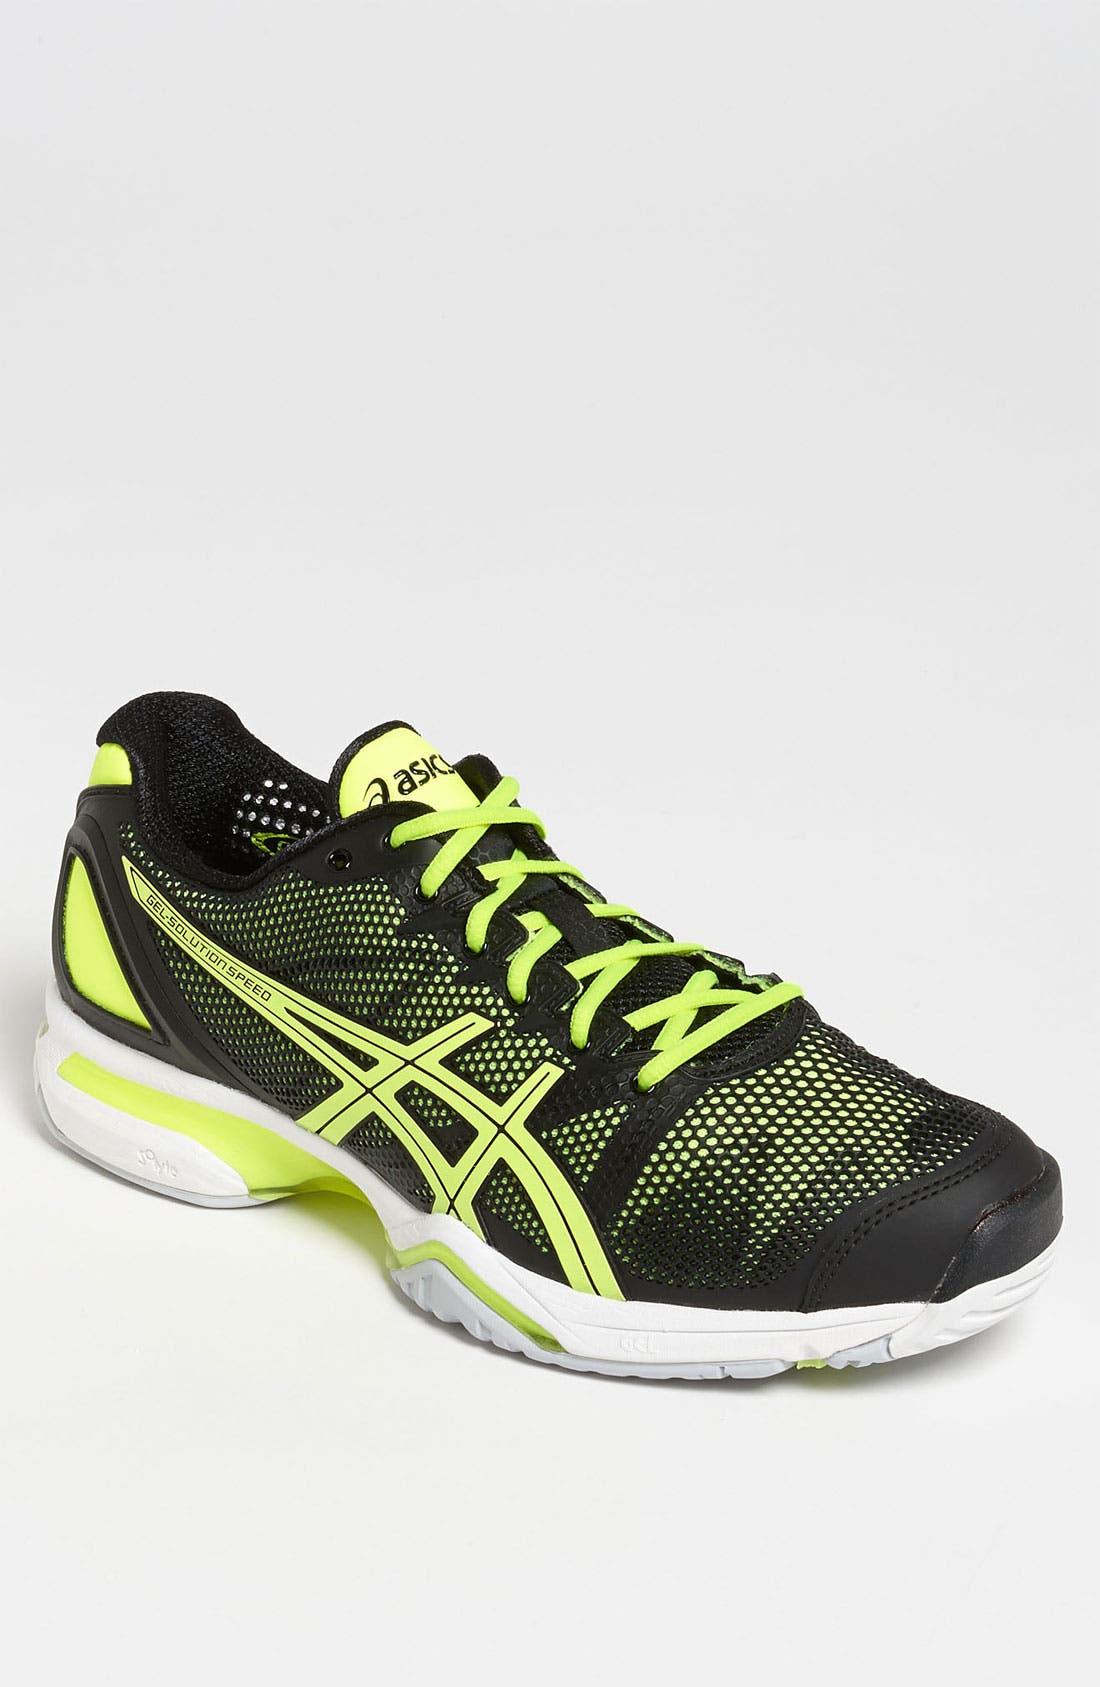 Alternate Image 1 Selected - ASICS® 'GEL-Solution Speed' Tennis Shoe (Men)